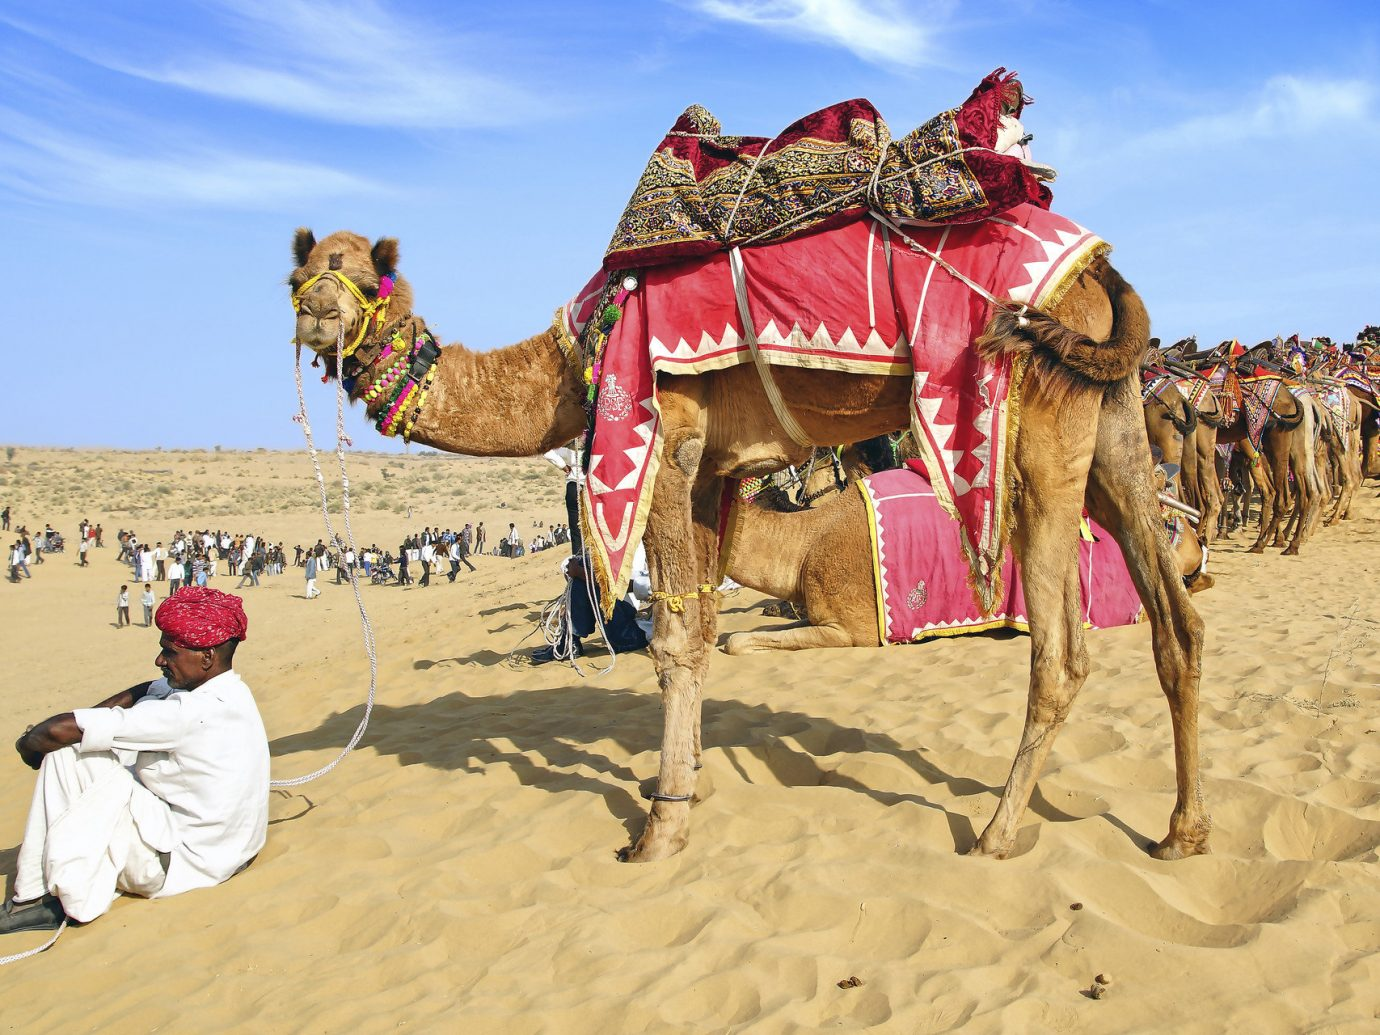 Travel Tips sky Camel outdoor natural environment camel like mammal arabian camel sahara Desert landscape aeolian landform sand erg several